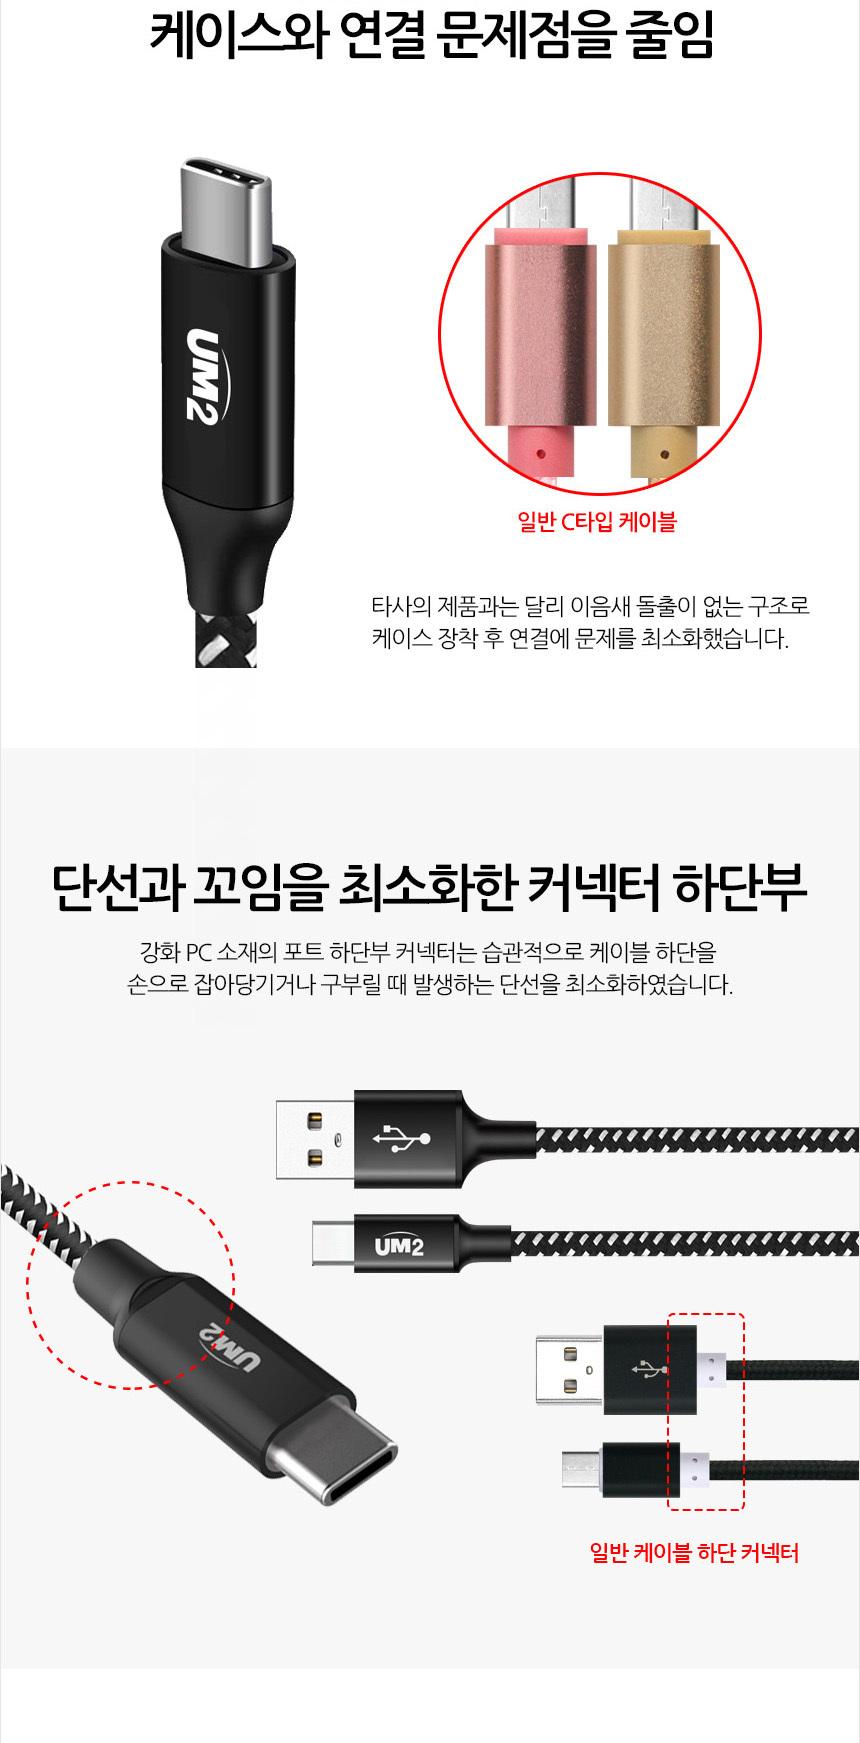 UM2 패브릭 USB C타입 고속 충전 케이블 - 에스엔, 2,900원, 케이블, C타입